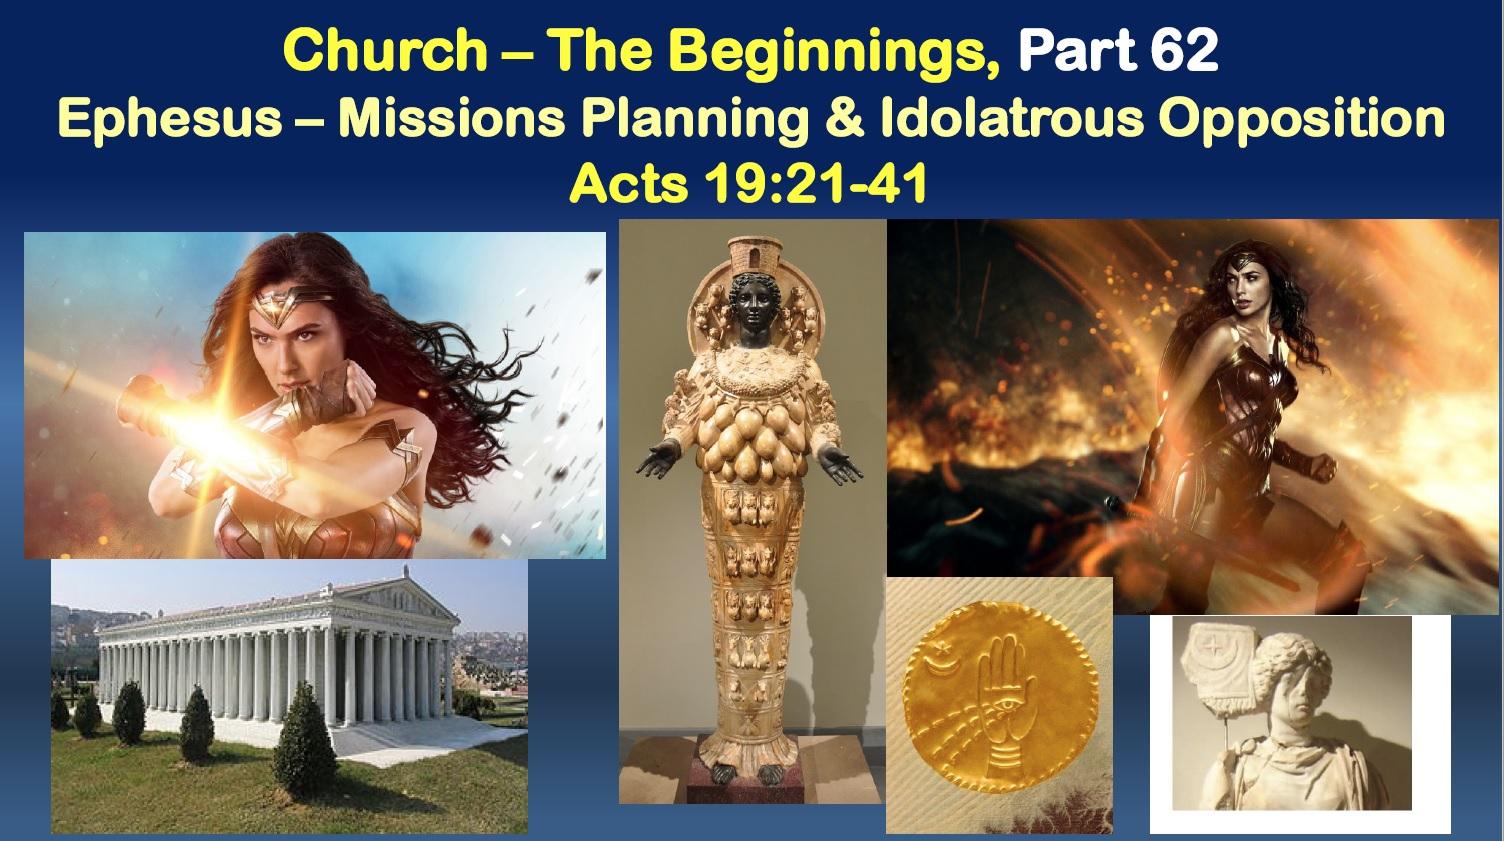 Ephesus – Paul, Missions, Demetrius, and Wonder Woman?